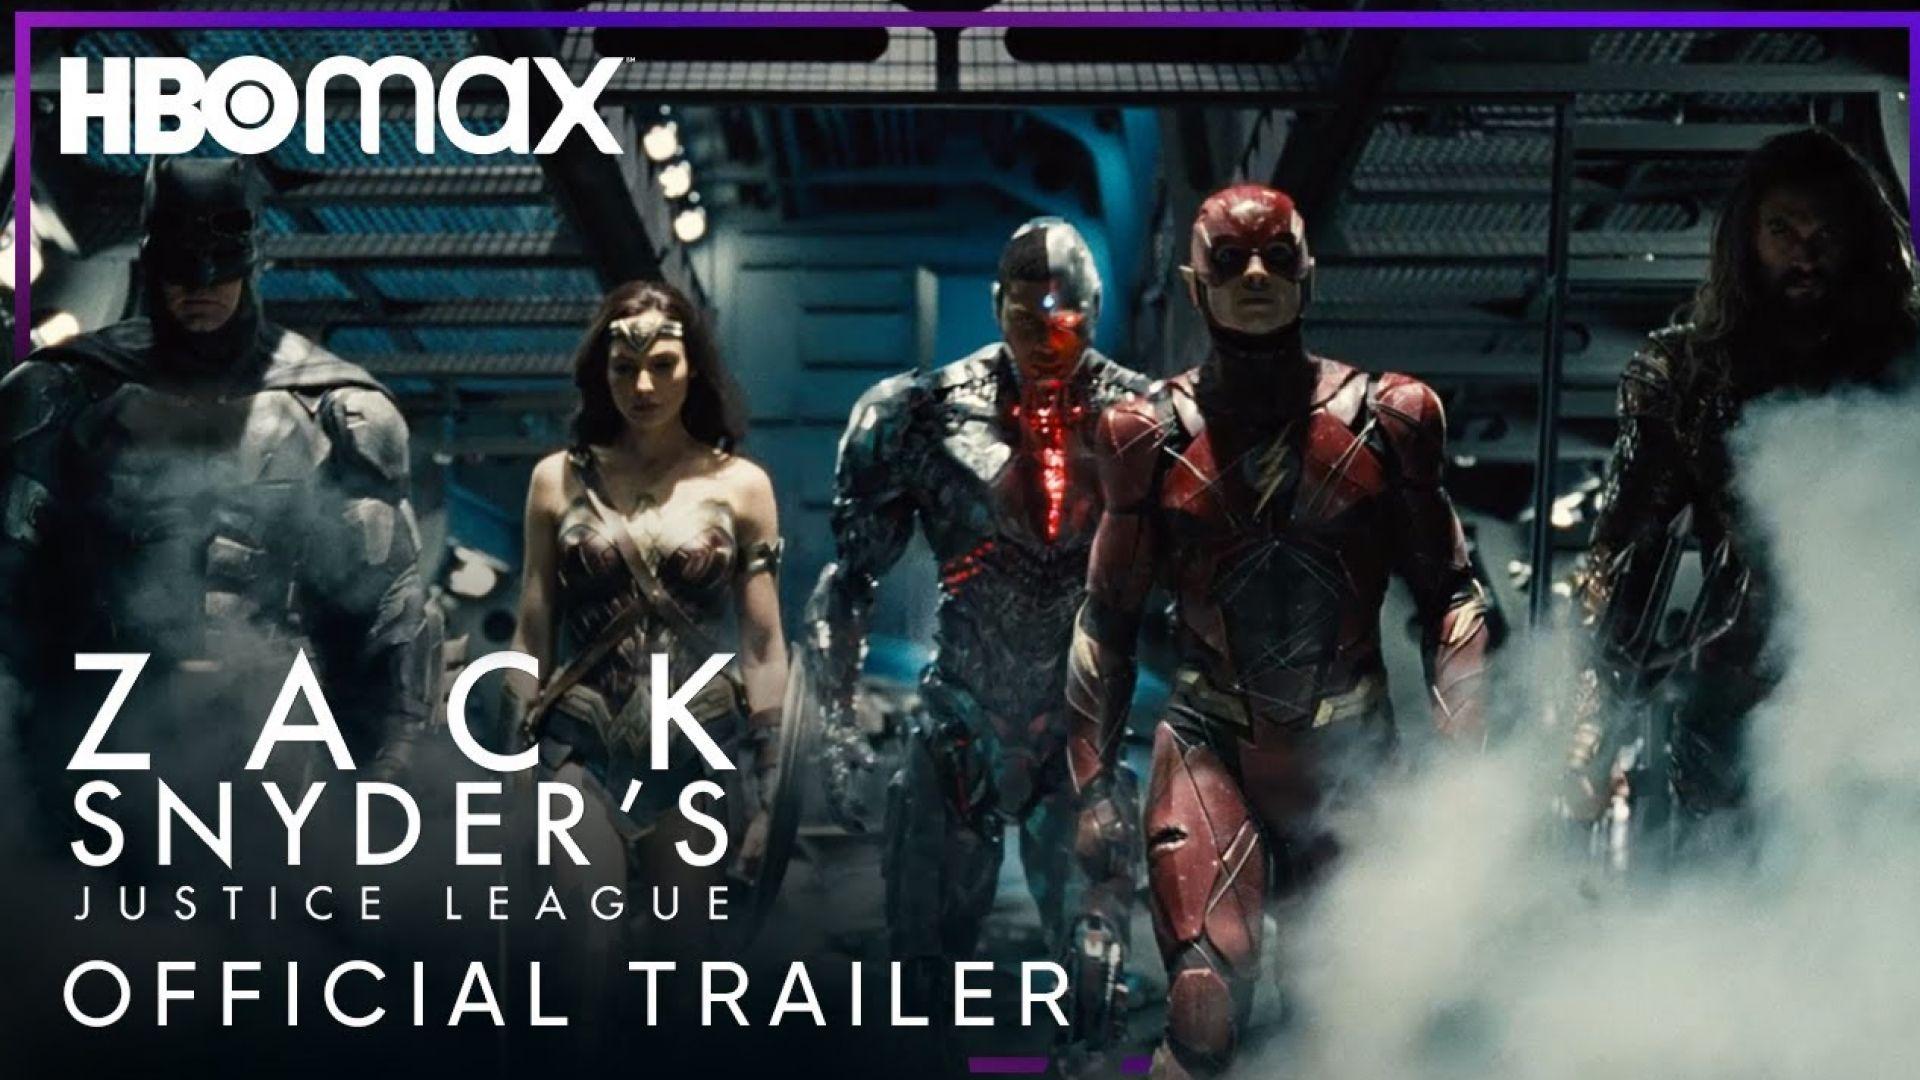 'Justice League: Snyder Cut' Official Trailer